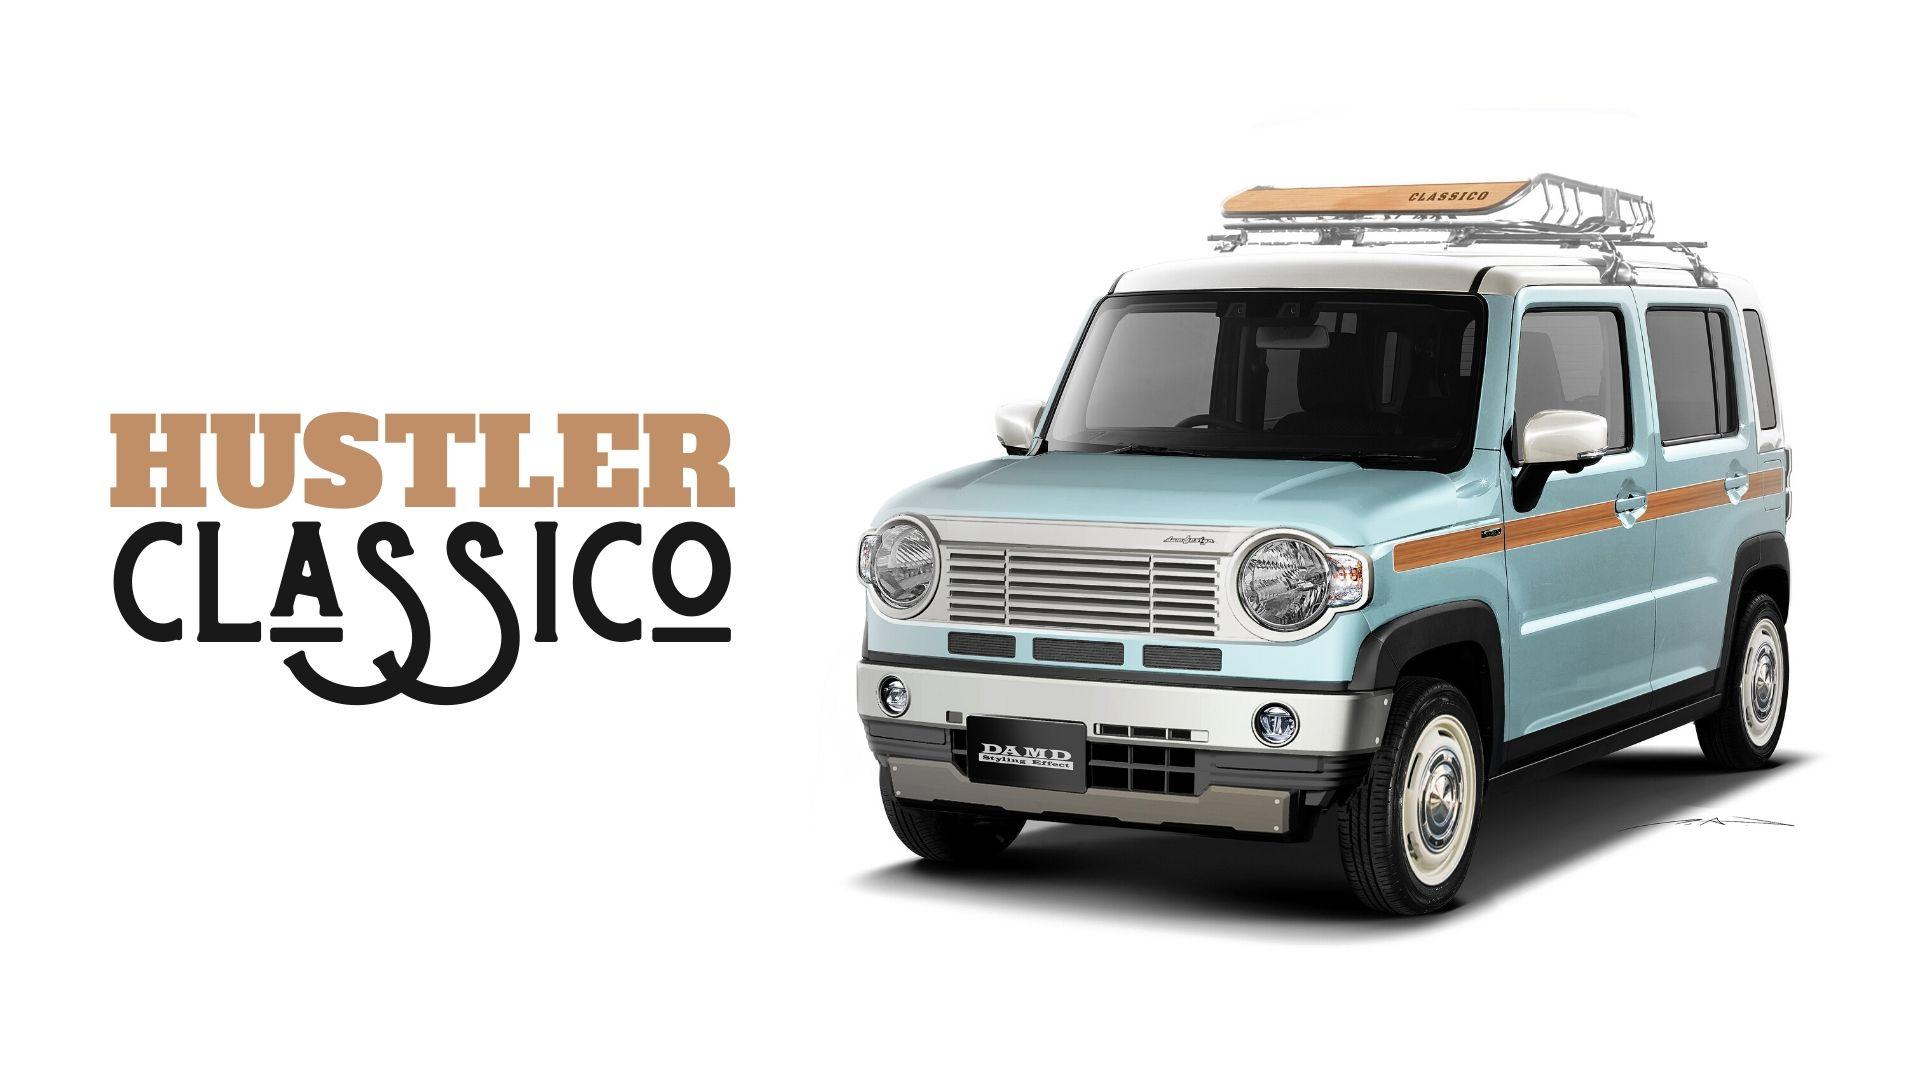 DAMD HUSTLER Classico (ハスラー・クラシコ) MR52S/MR92S ハスラー